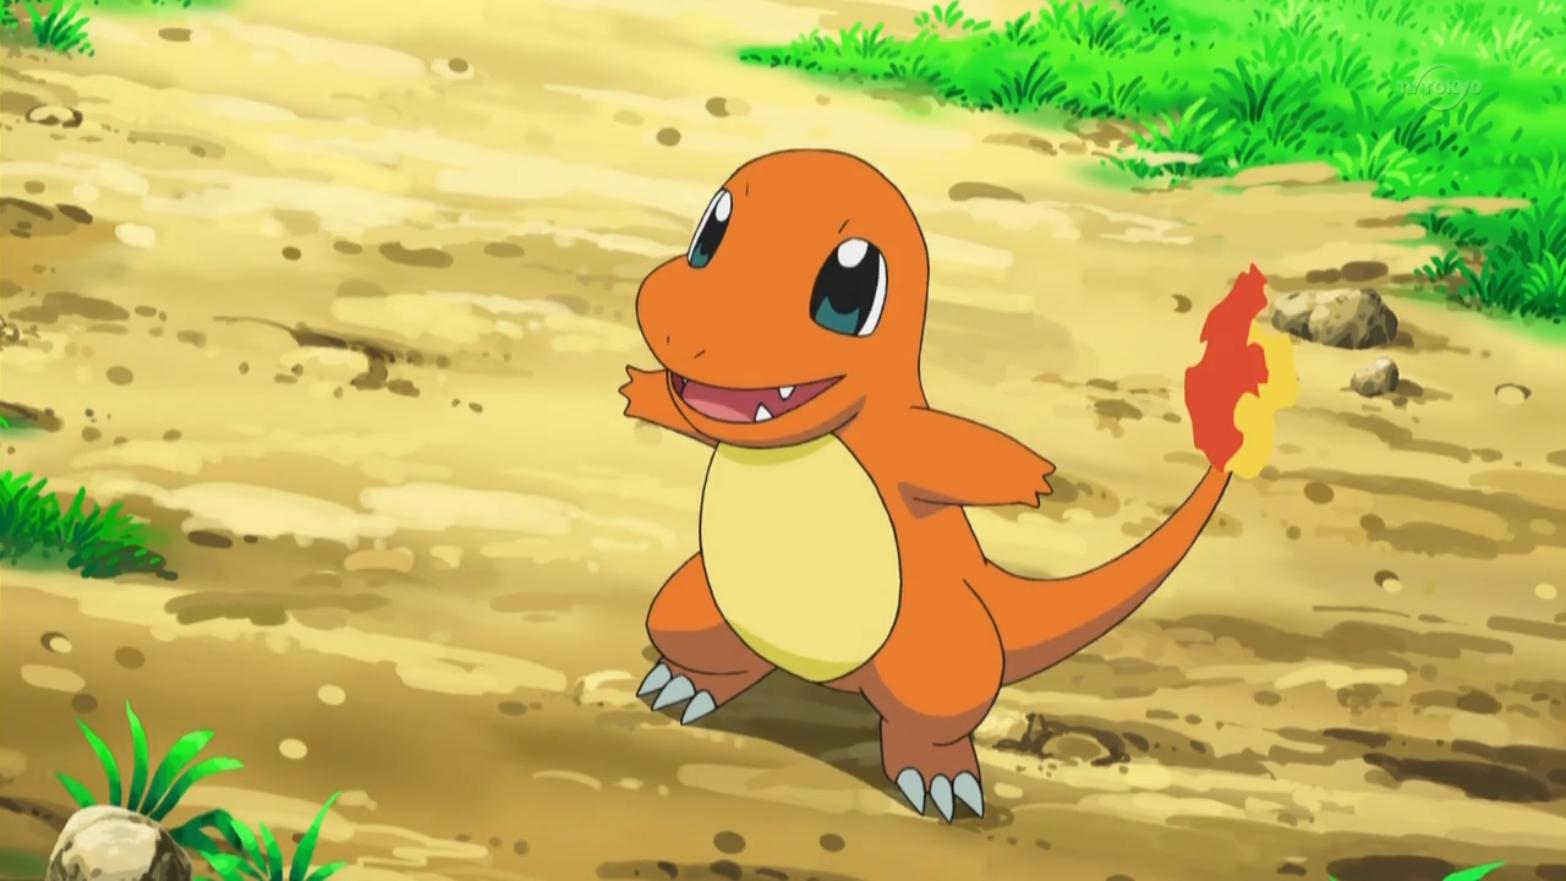 Pokemon Fire Red - Battle vs Champion Gary - YouTube